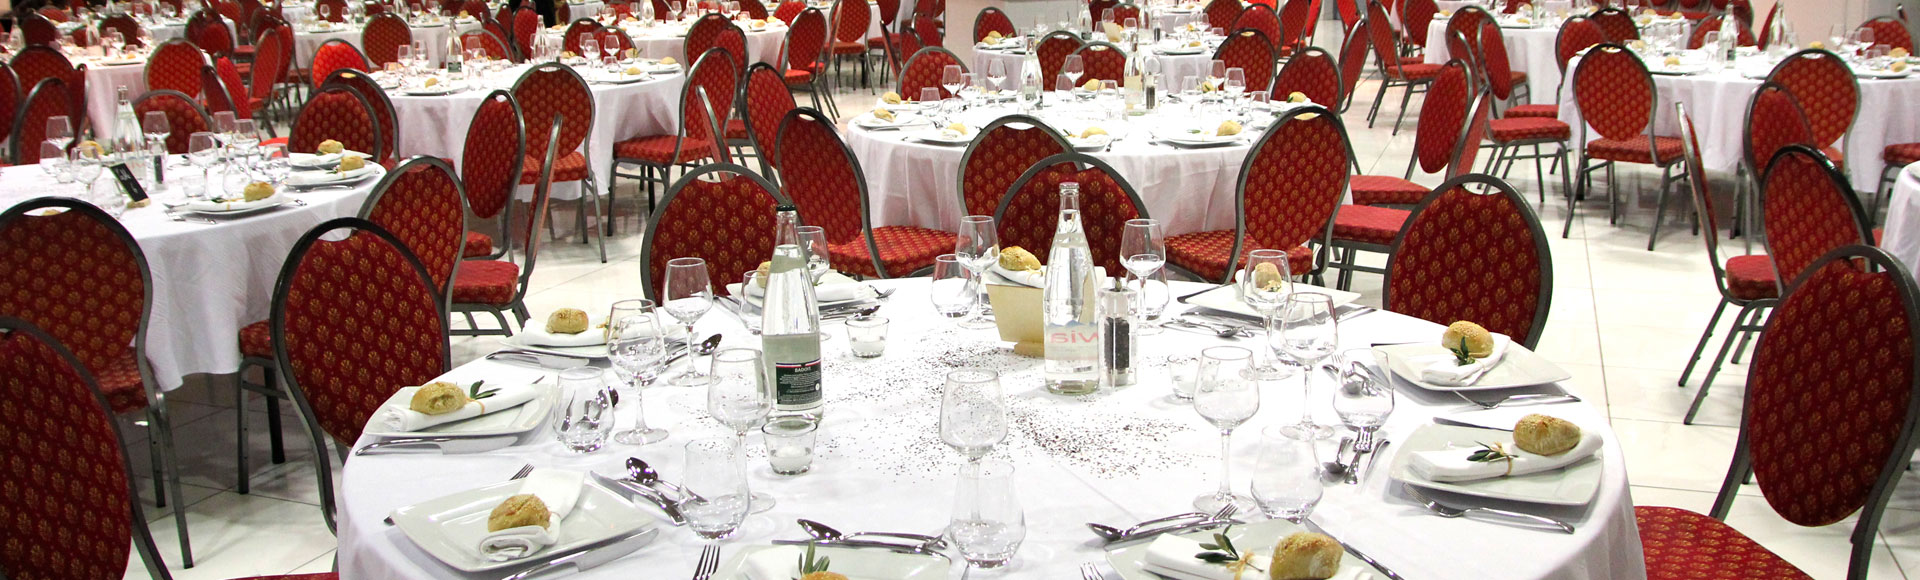 salle repas entreprise marseille florida palace